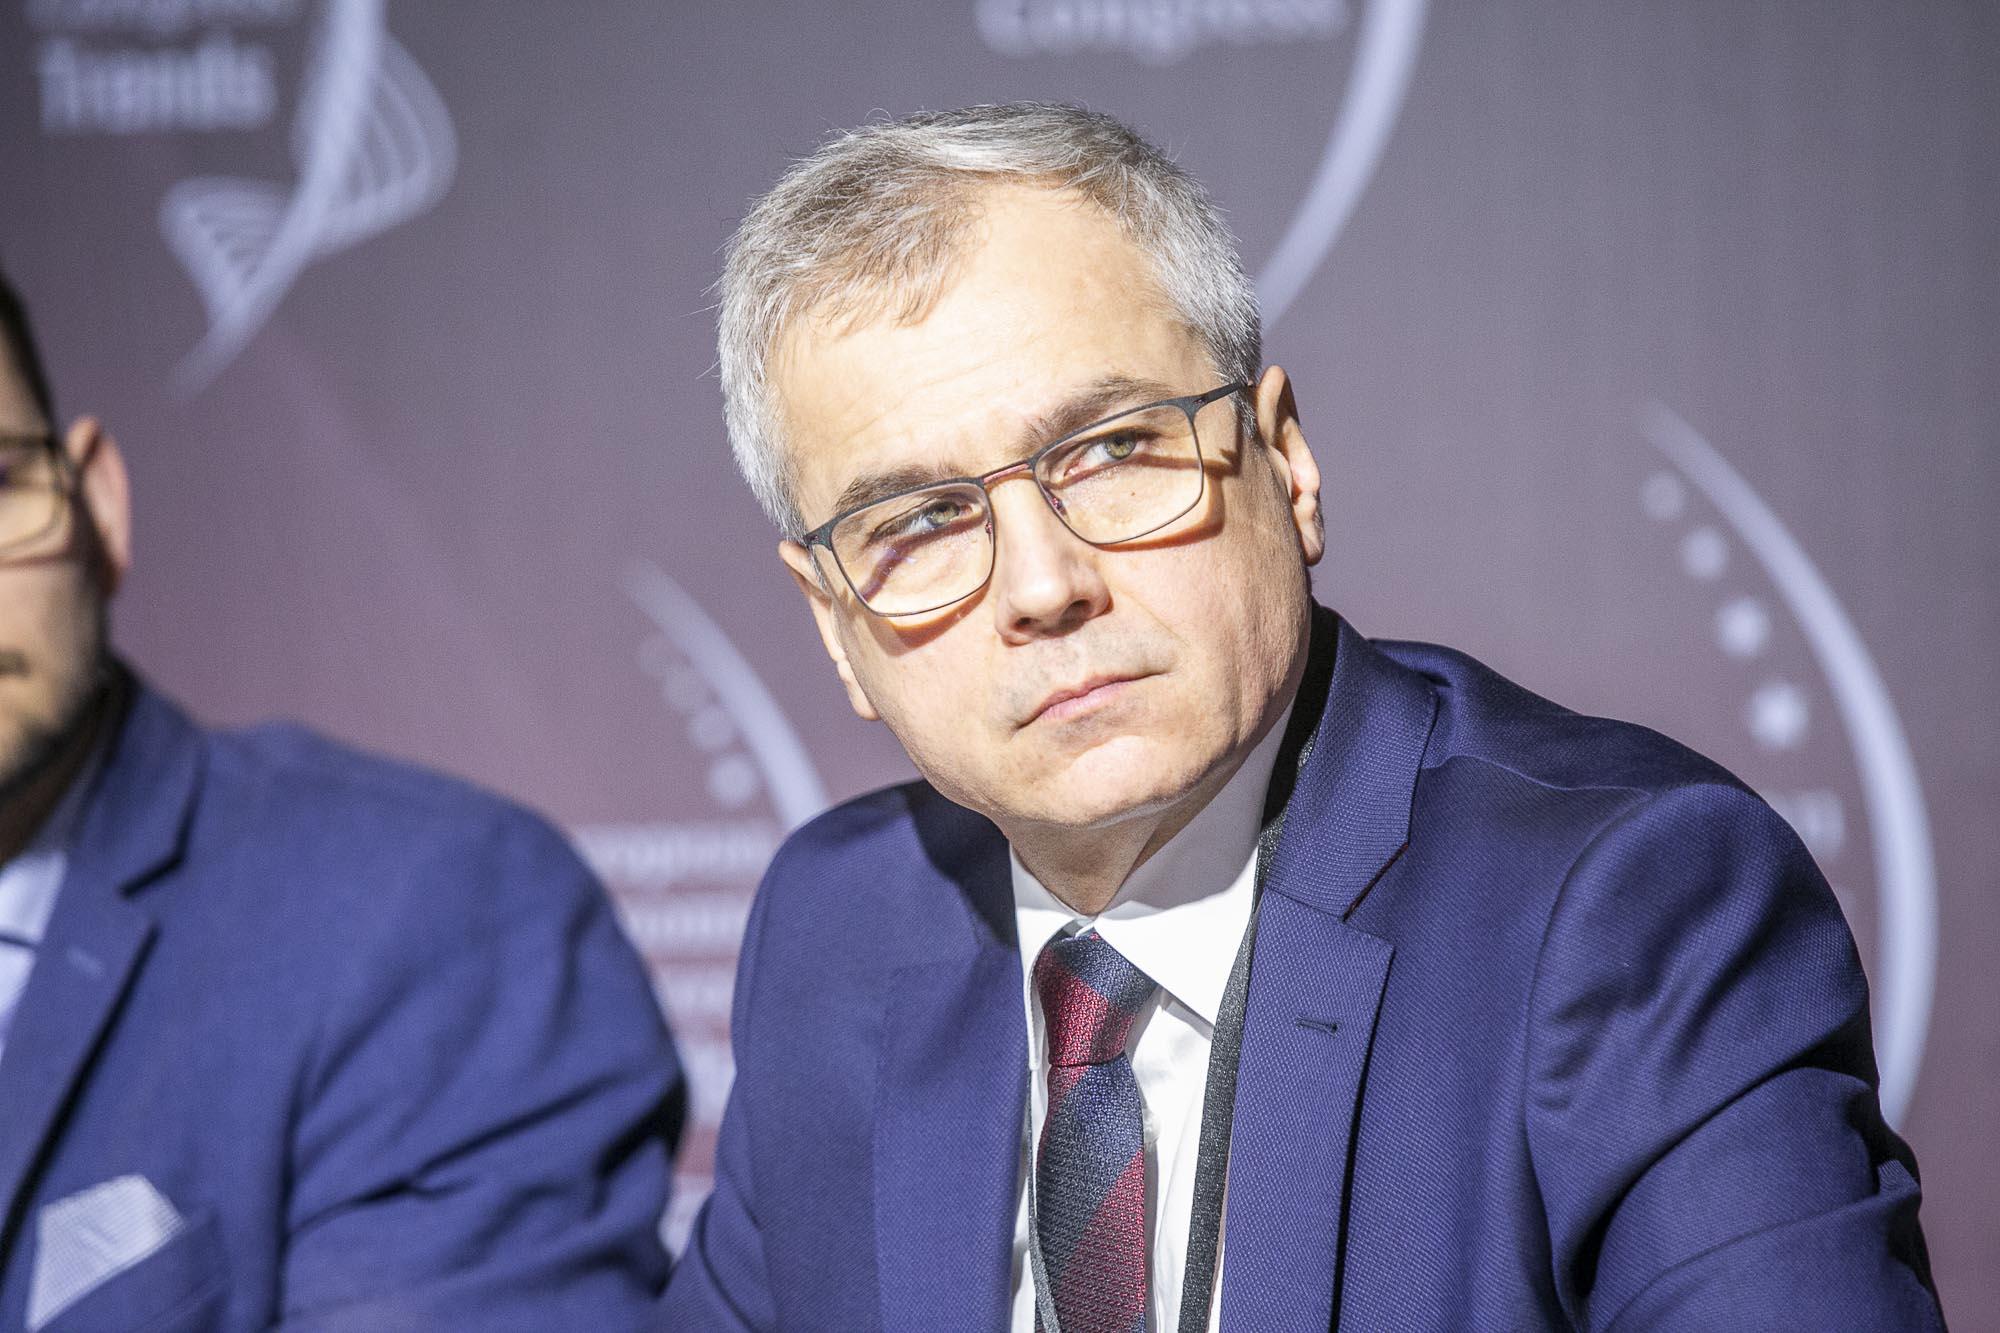 Prof. Arkadiusz Mężyk, rektor Politechniki Śląskiej (fot. MM)